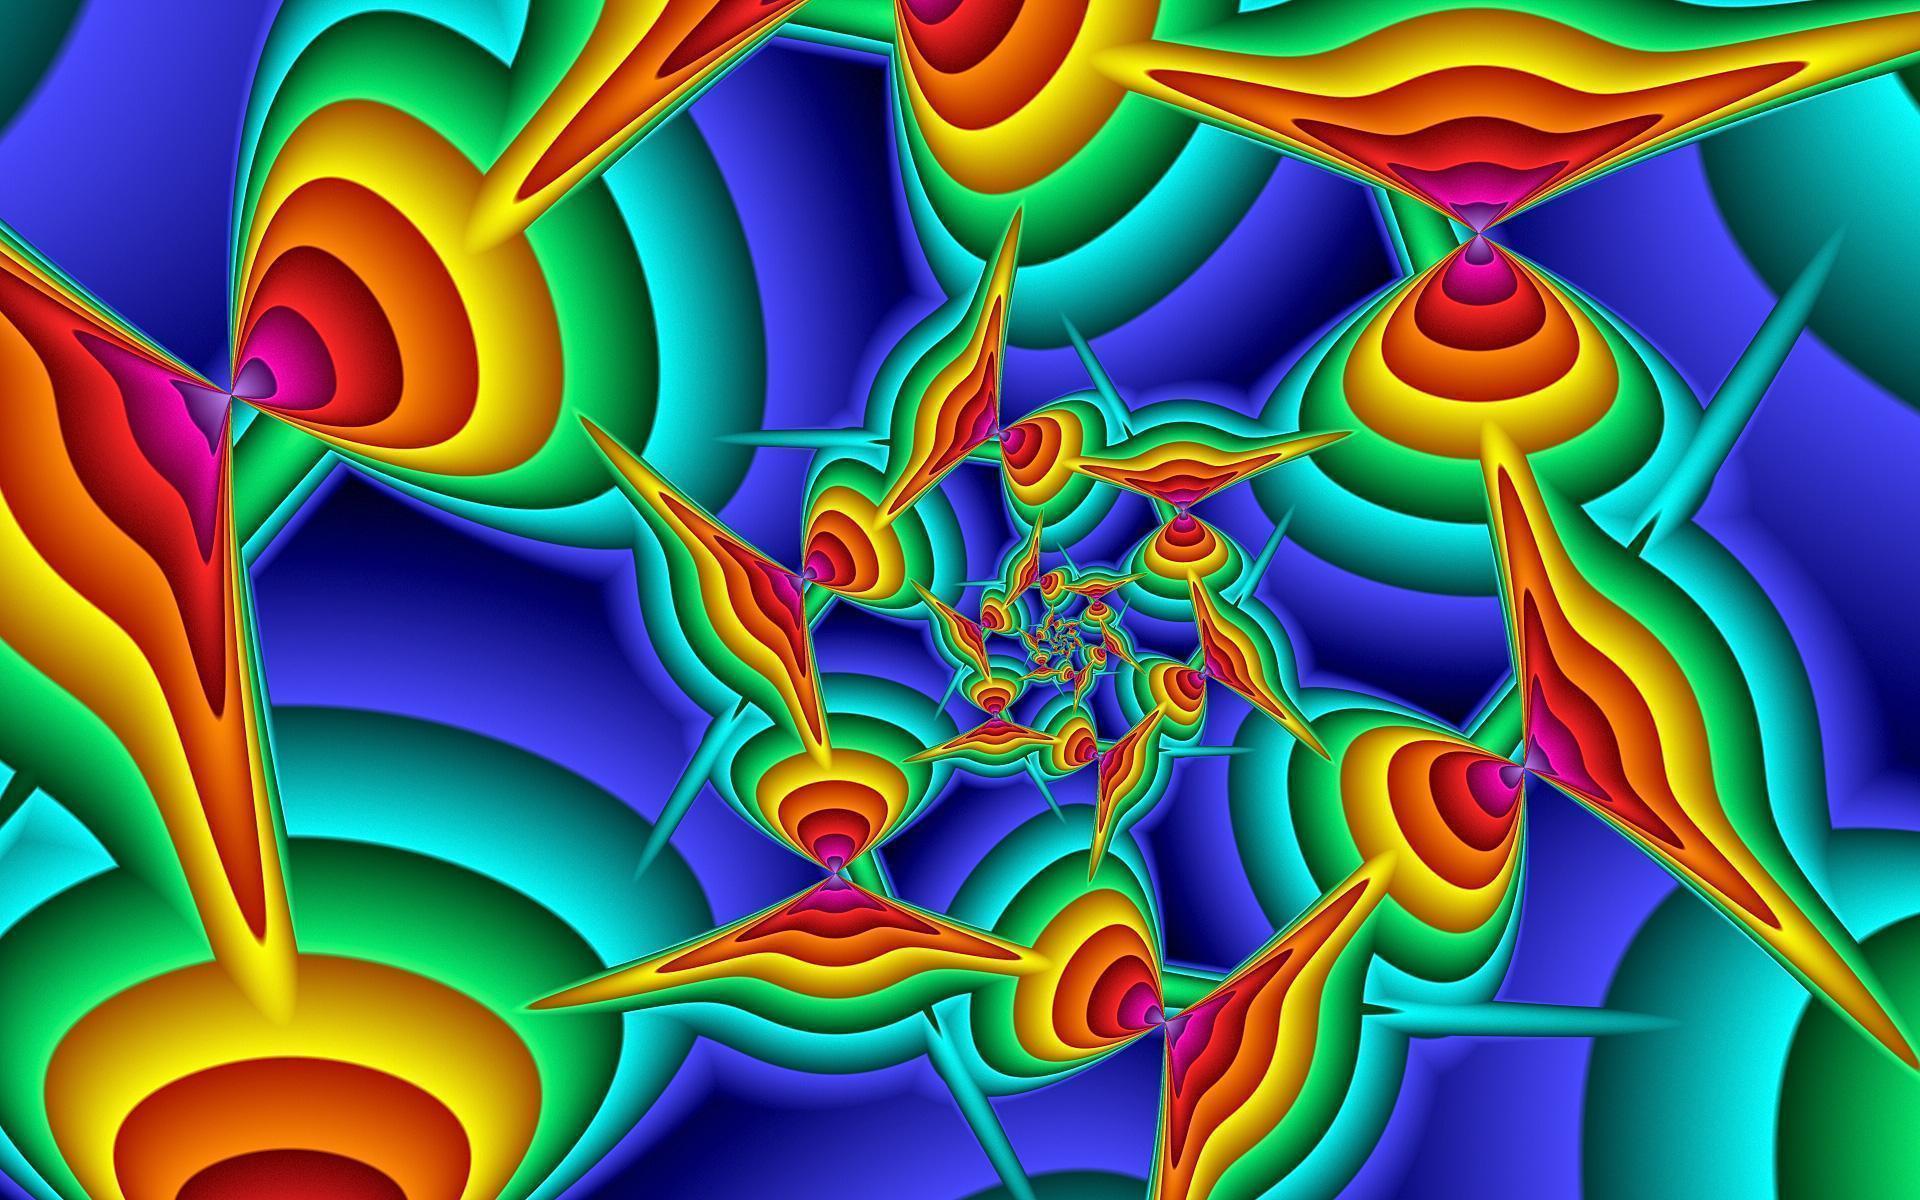 rainbow fractal wallpaper - photo #18